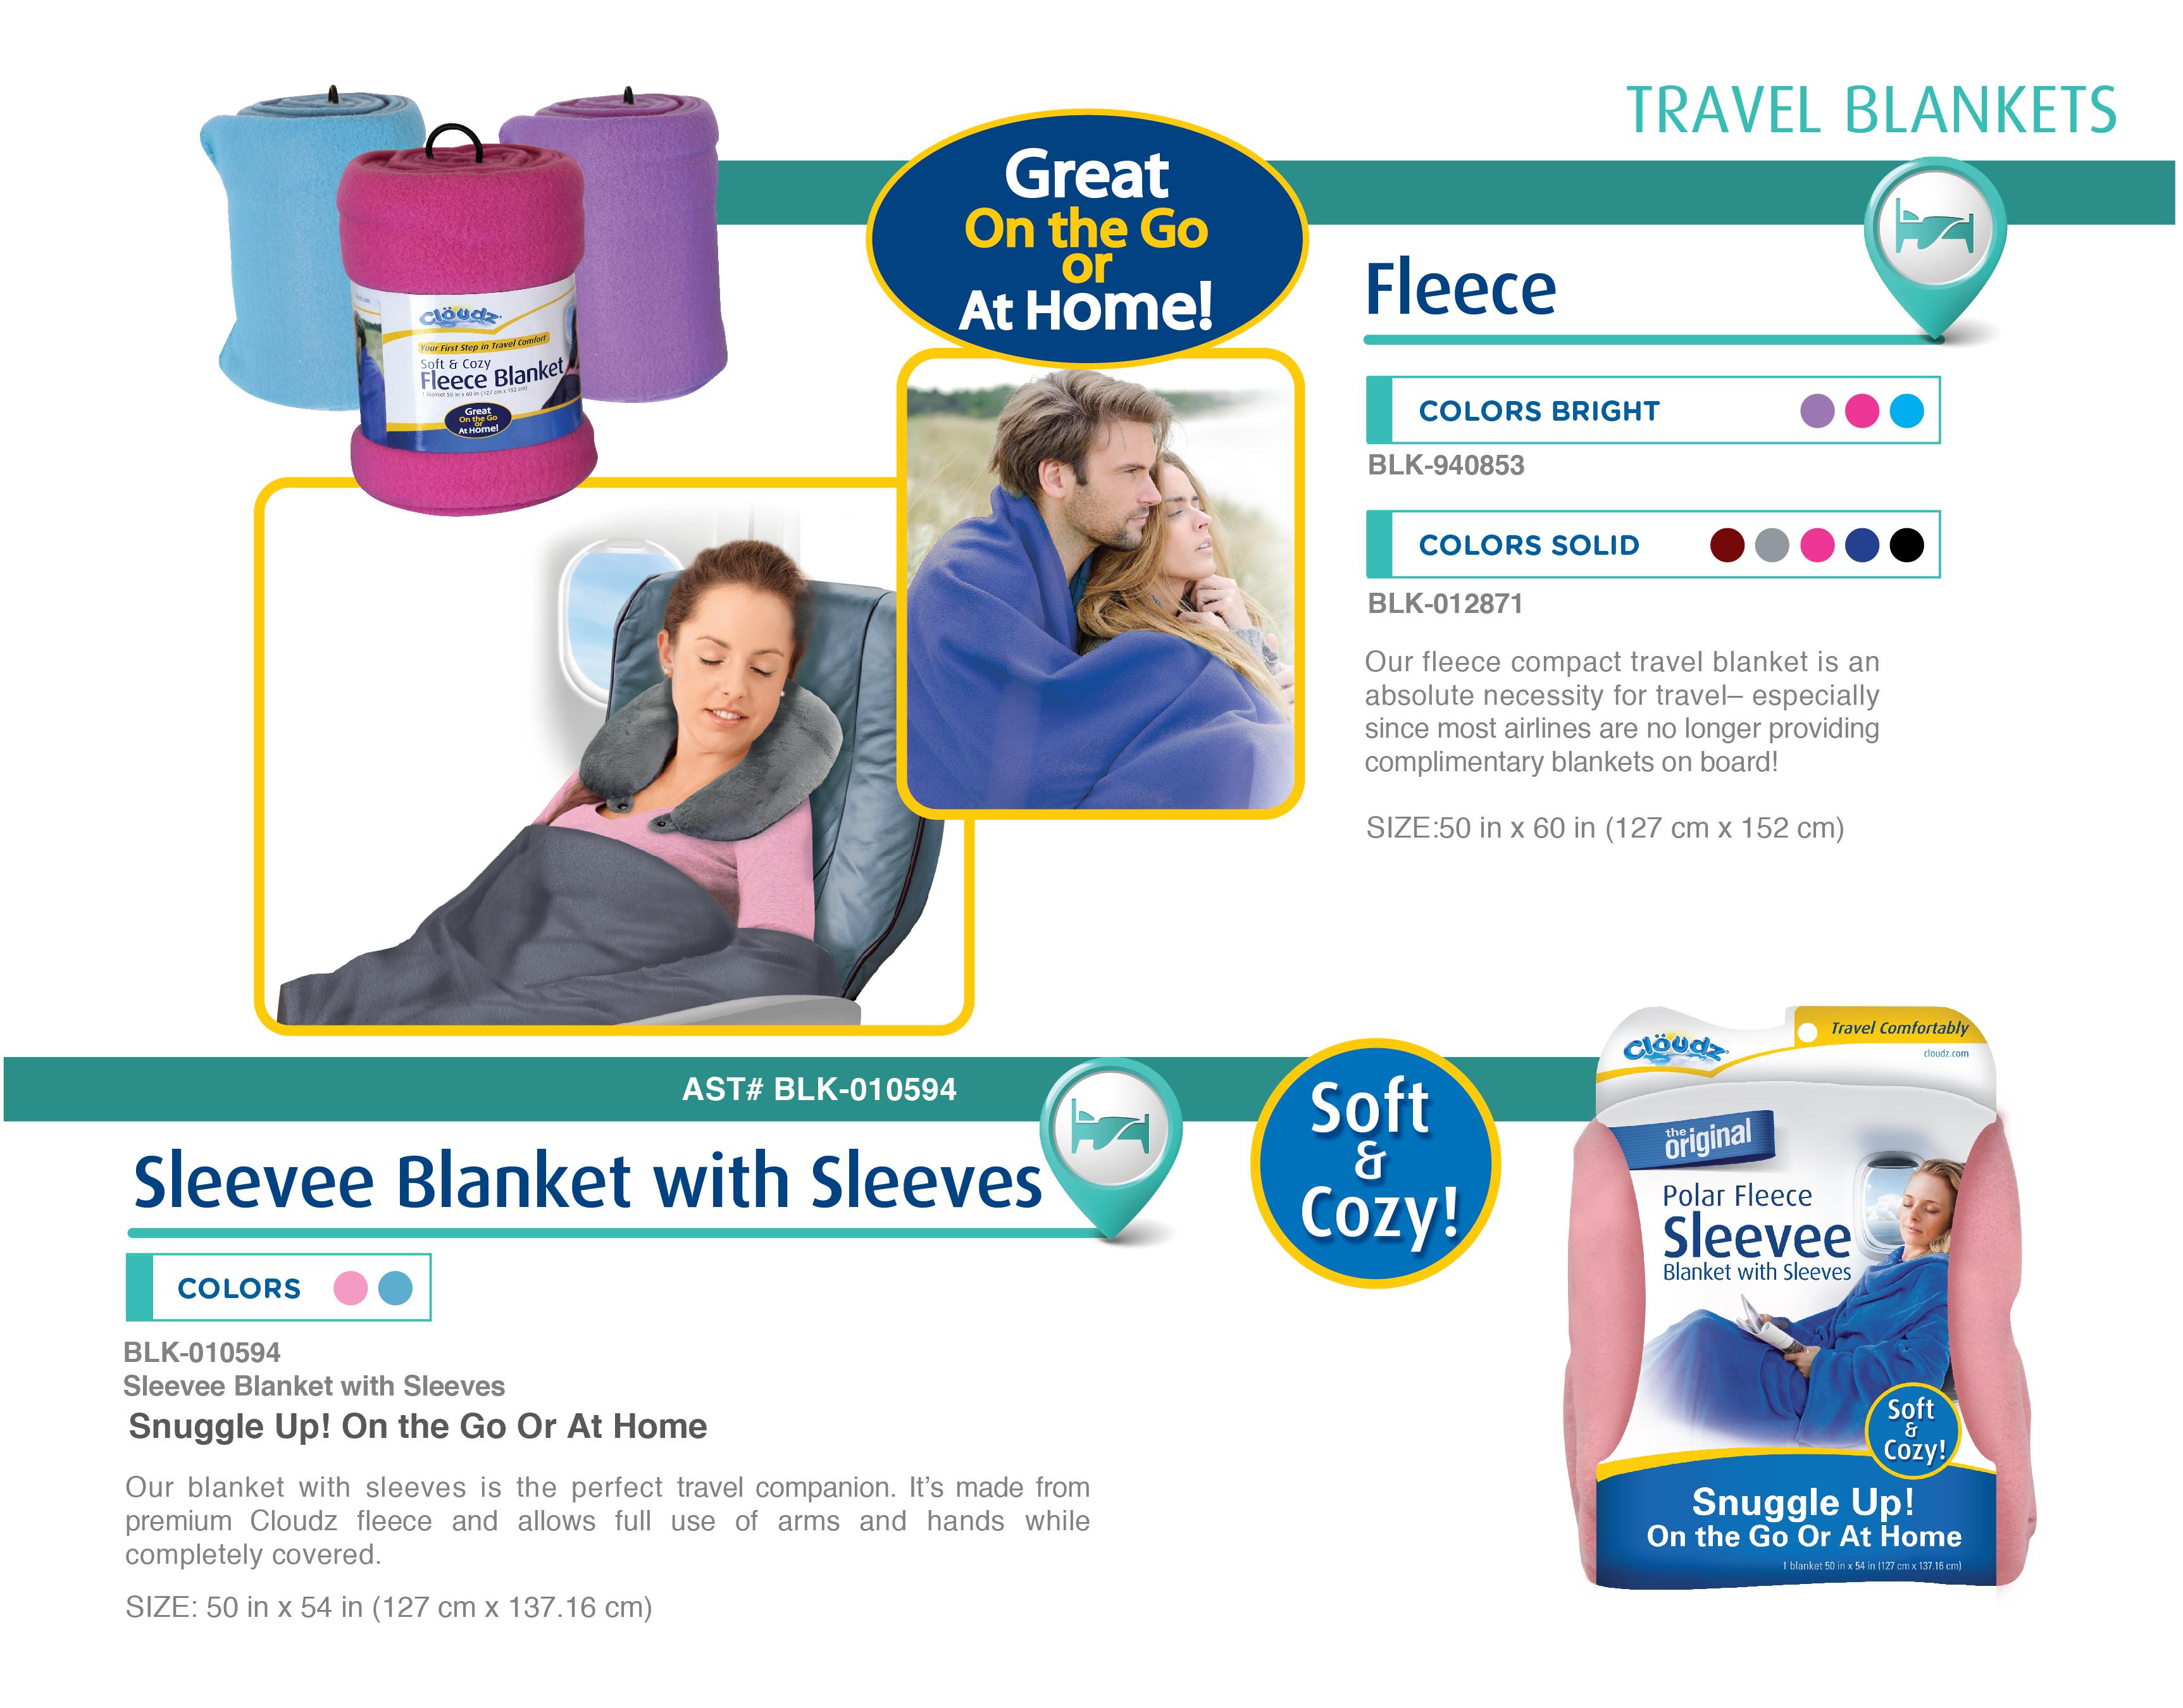 travel_blanket_section-02